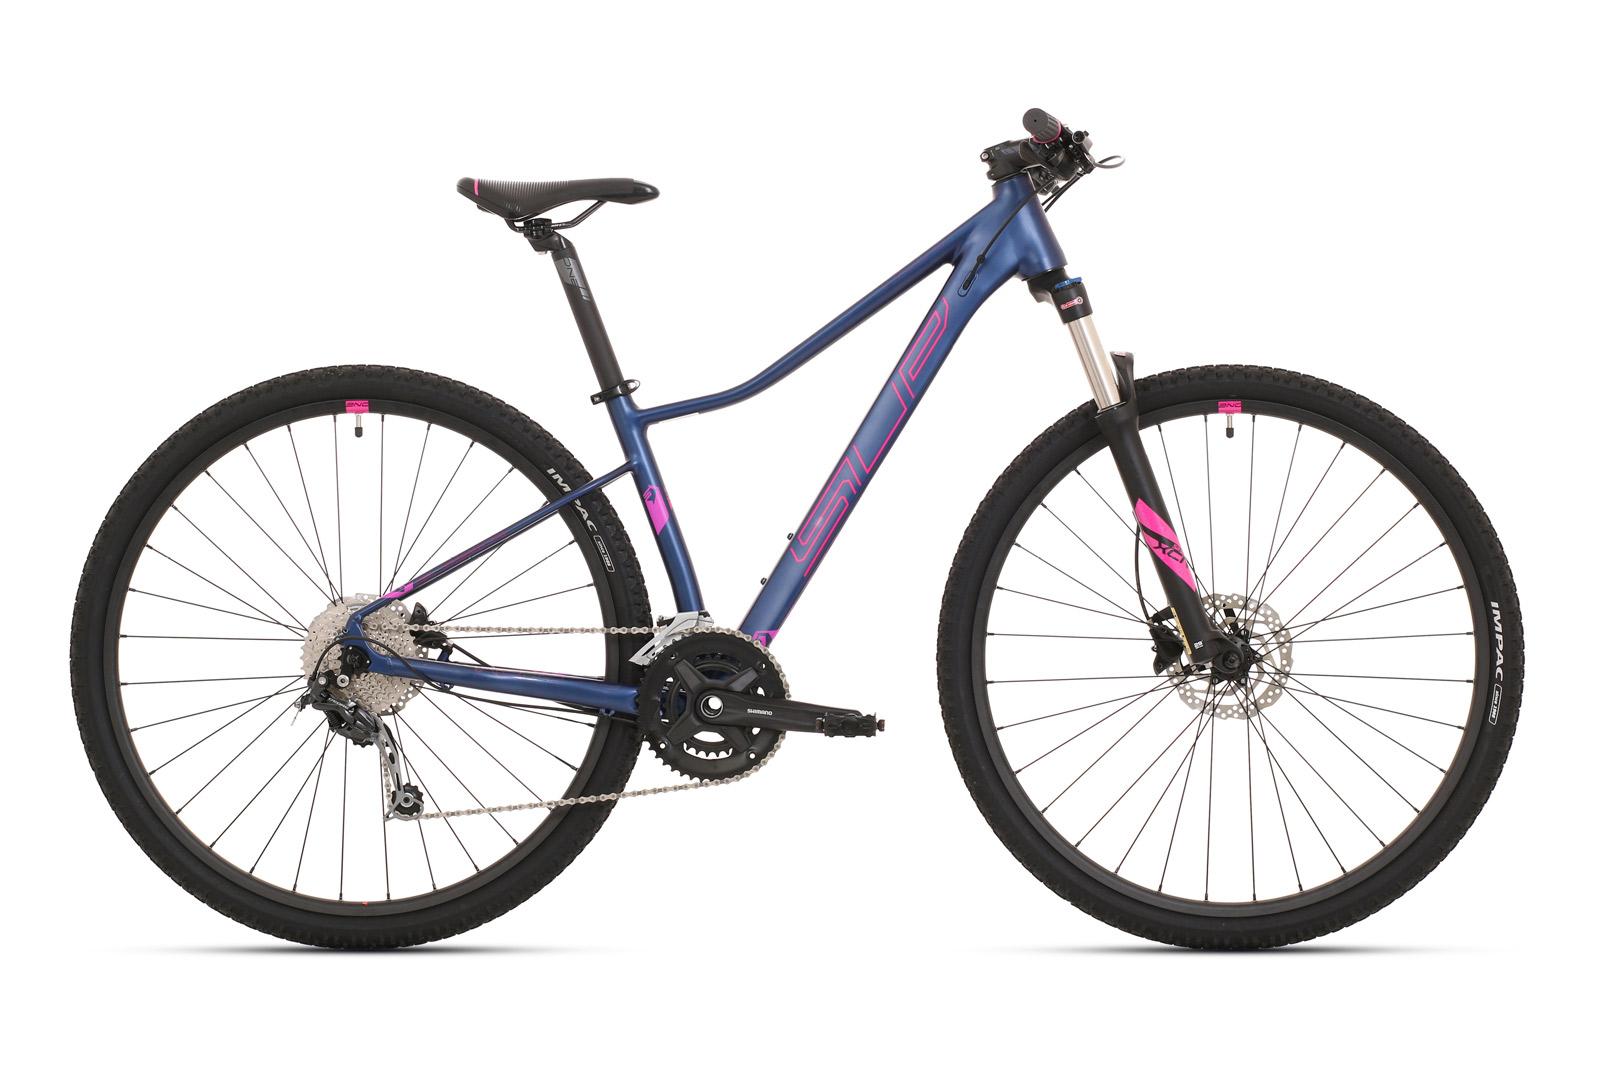 SUPERIOR Modo XC 869 Matte Night Blue/Pink 2020